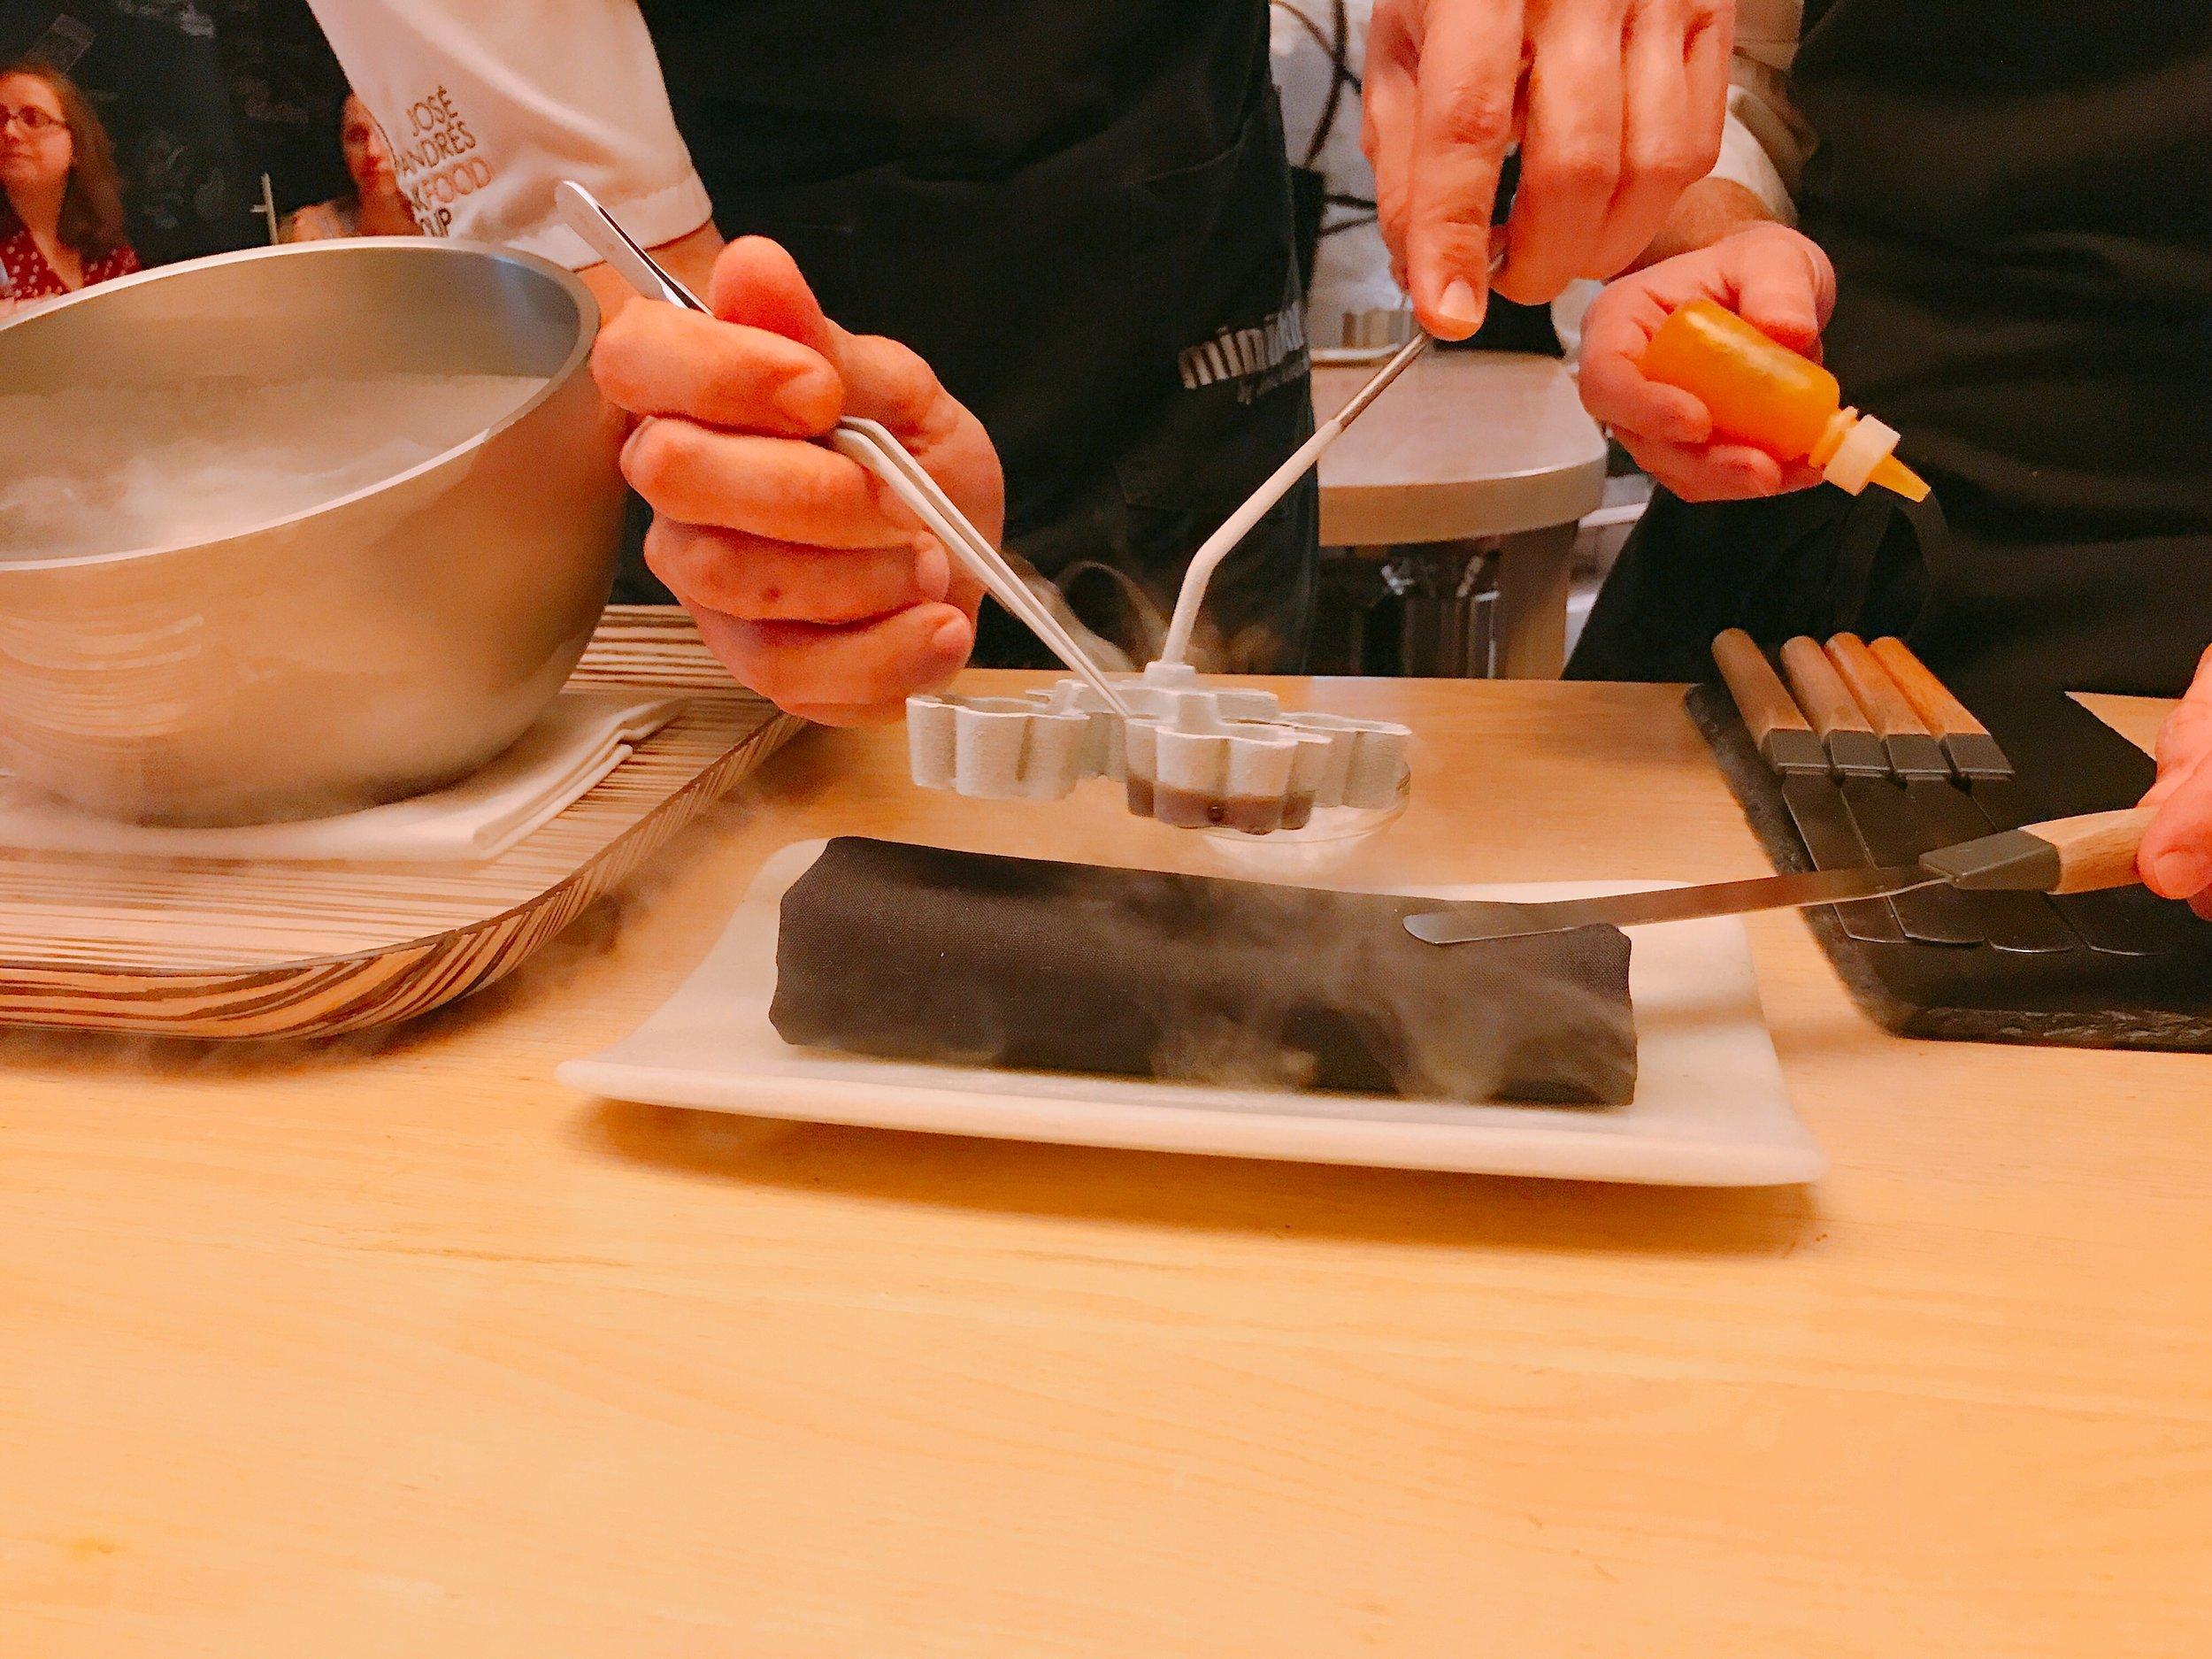 The culinary team crafting the pumpkin oil tart using liquid nitrogen